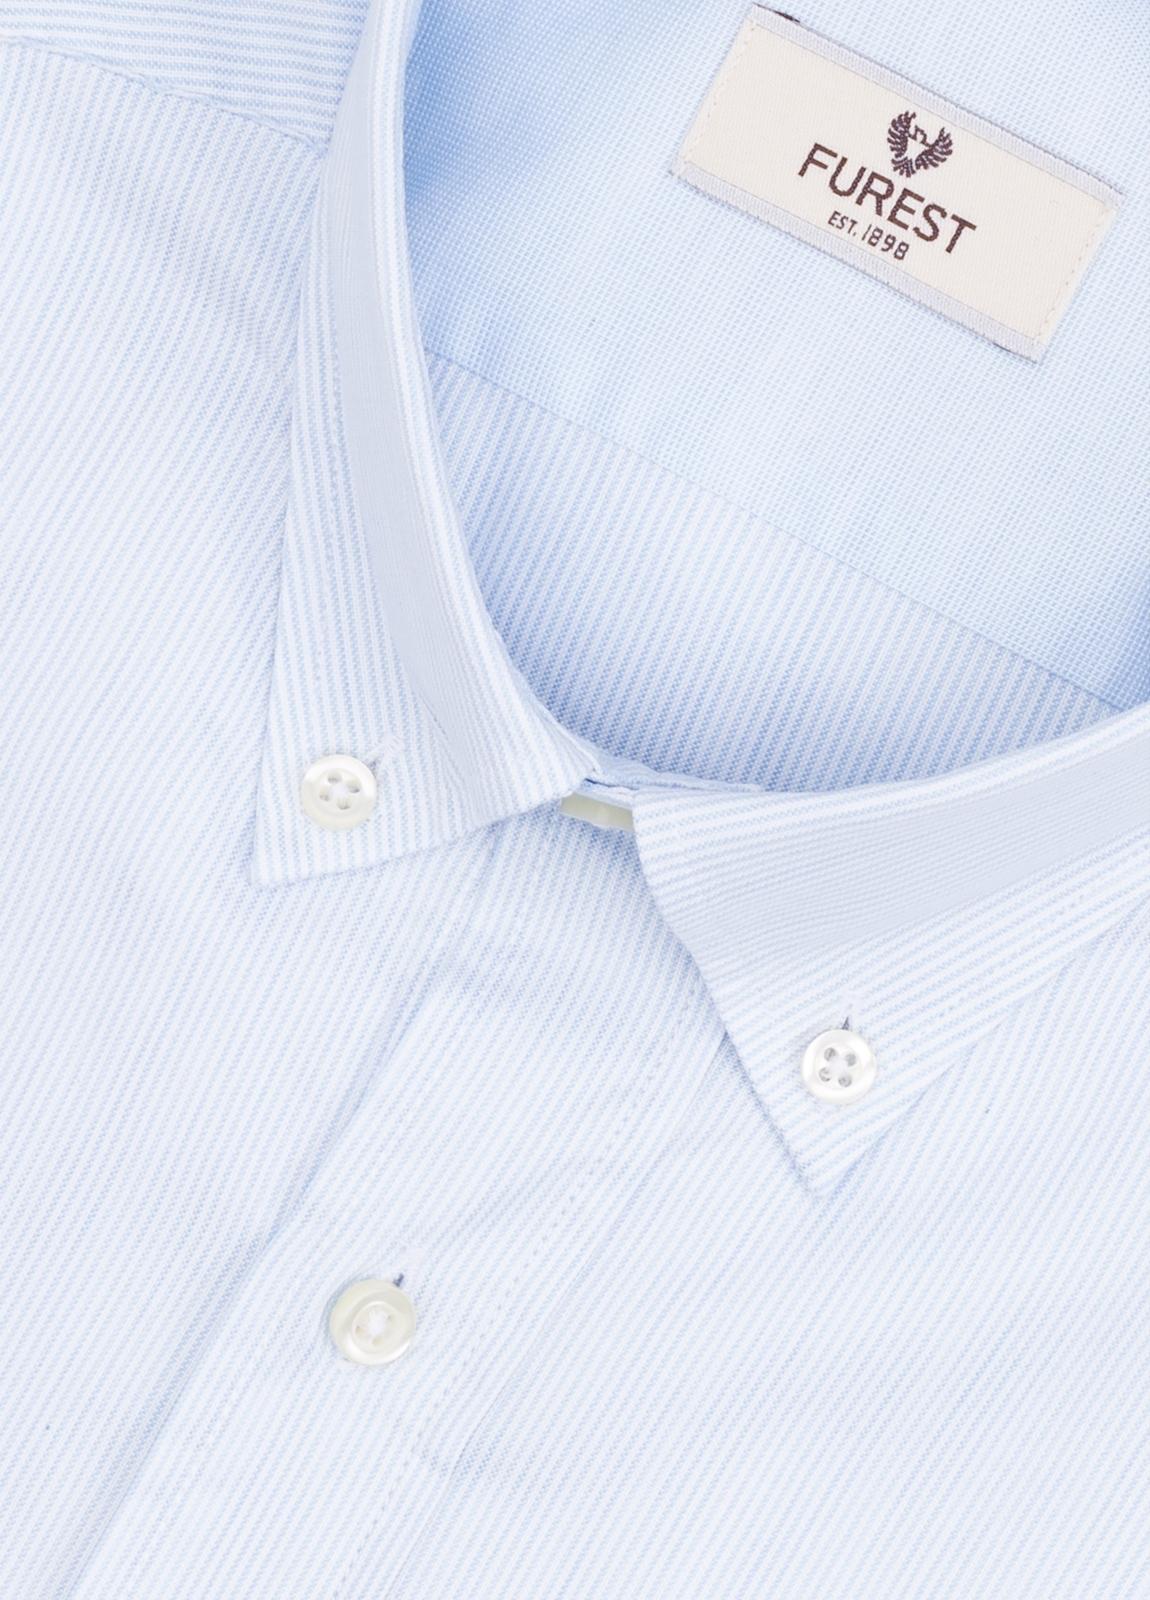 Camisa Leisure Wear REGULAR FIT Modelo BOTTON DOWN color celeste. 100% Algodón. - Ítem4